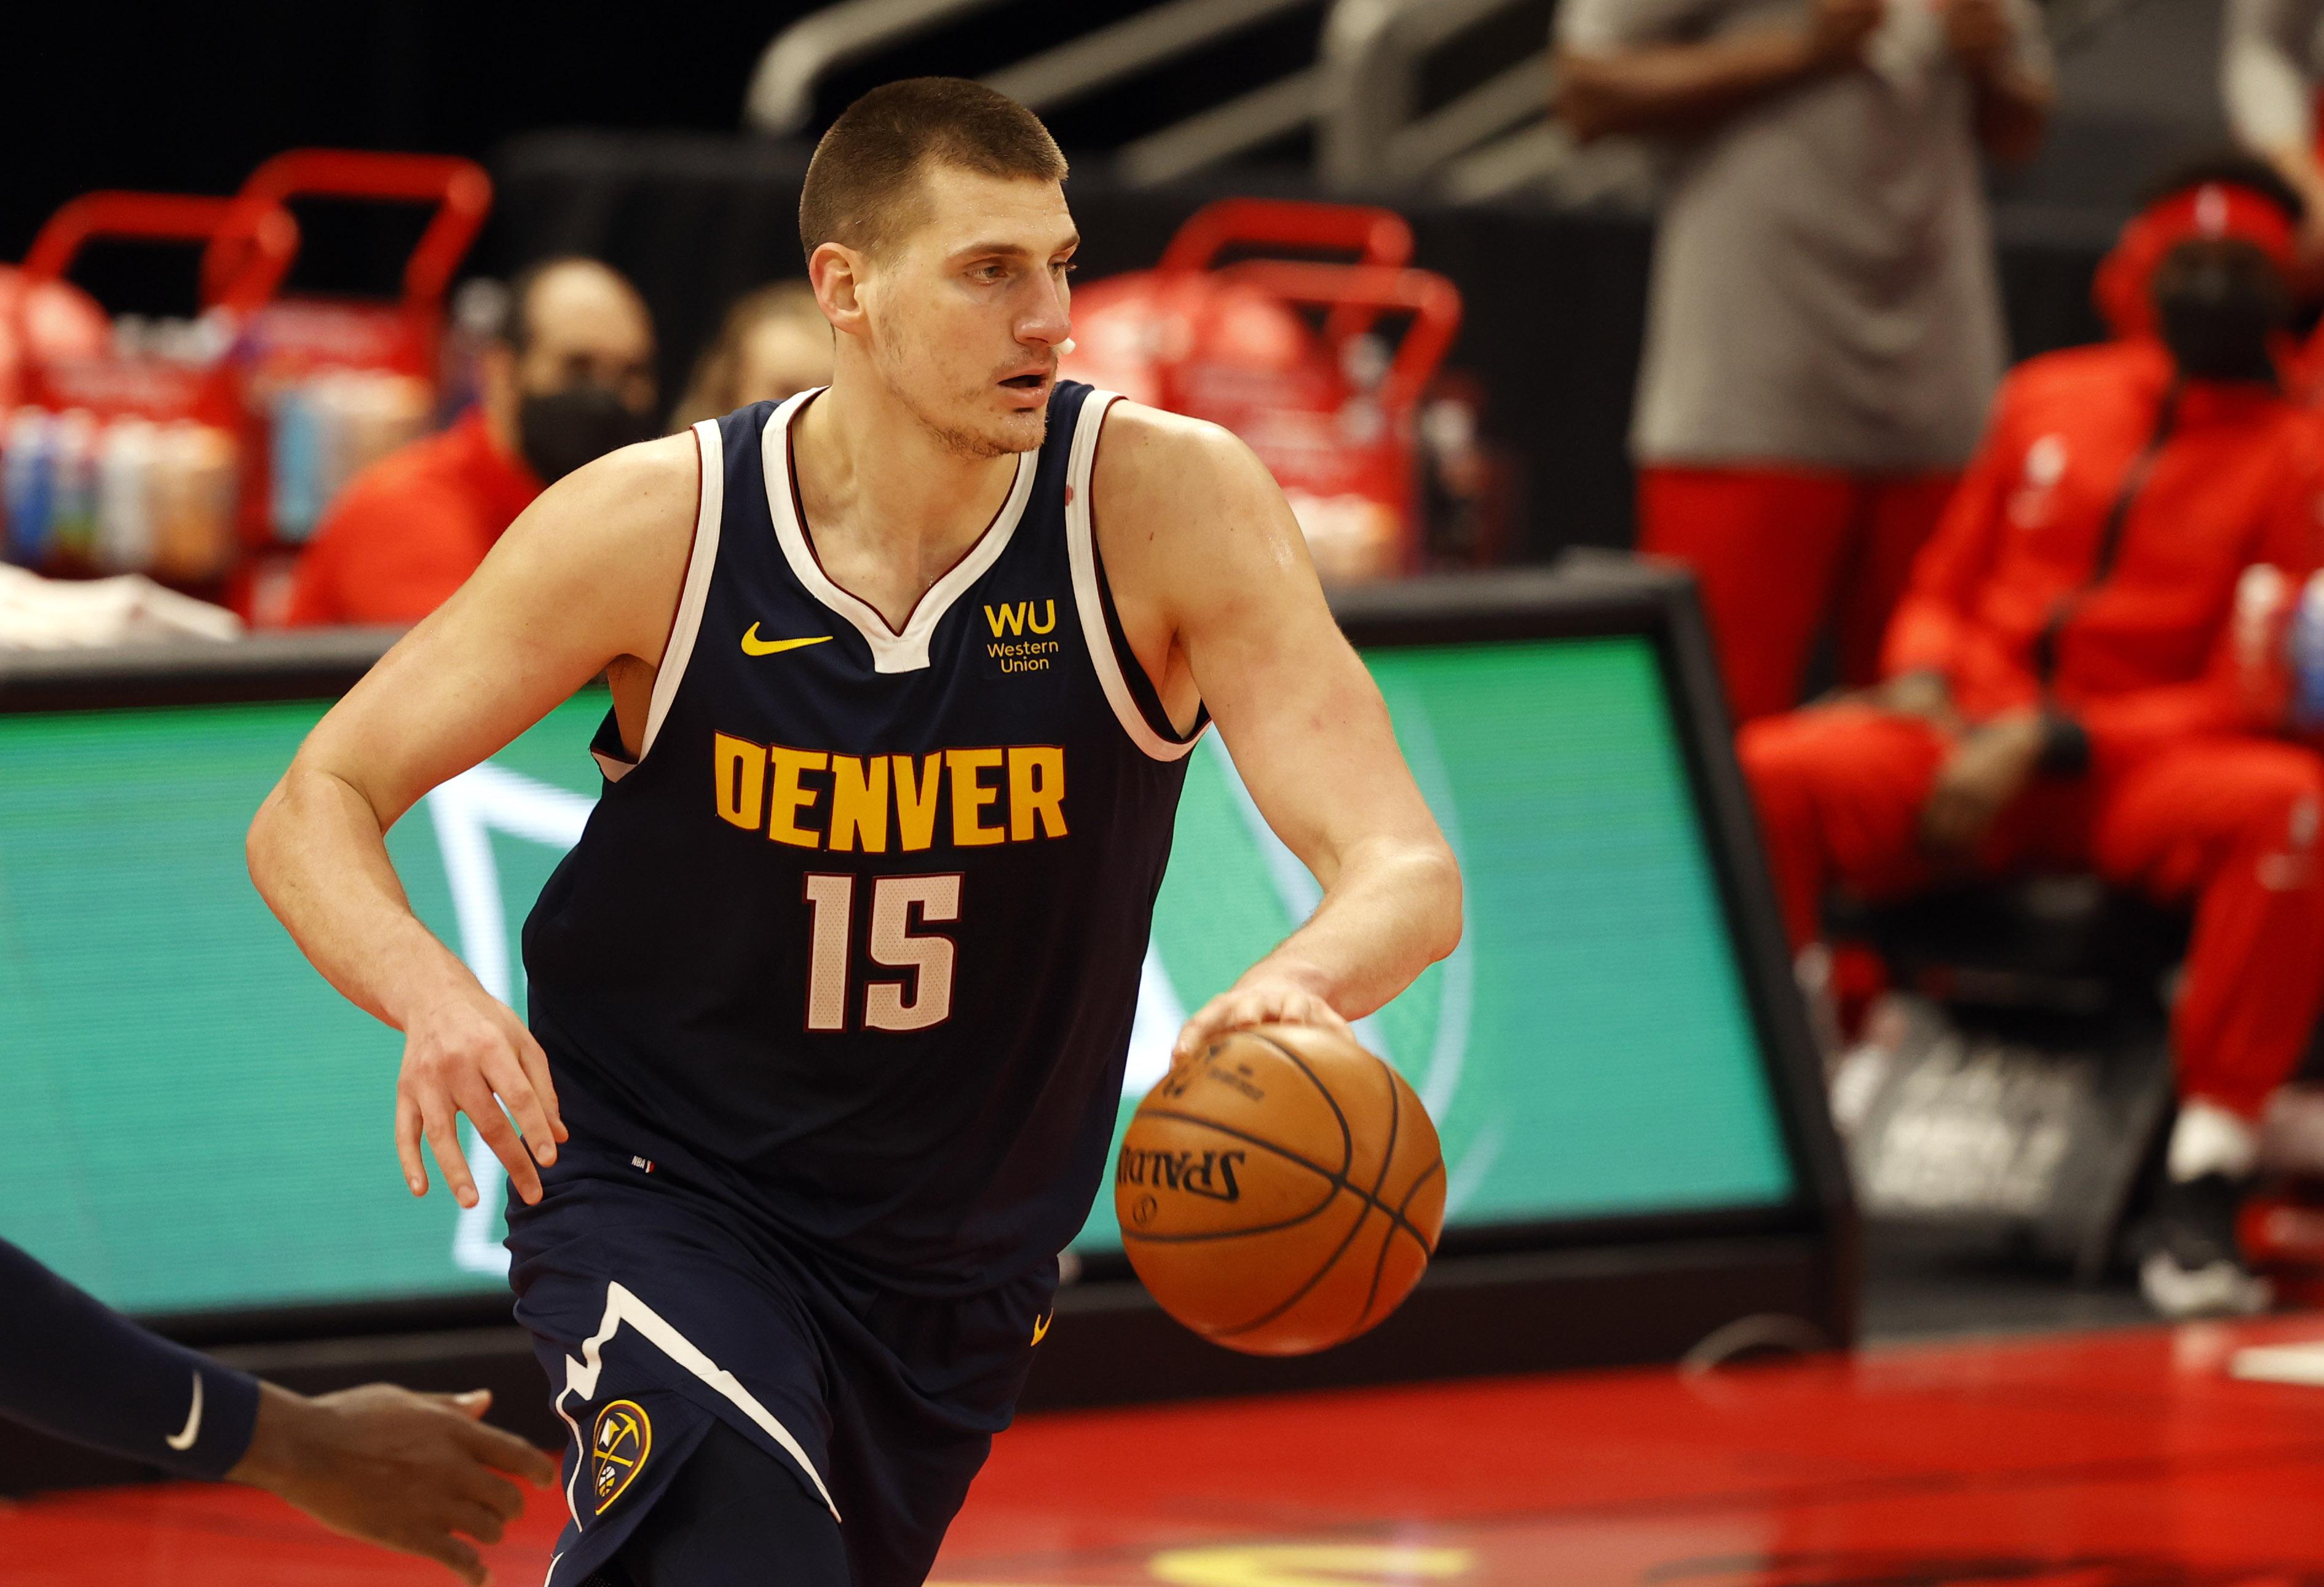 Denver Nuggets center Nikola Jokic moves to the basket against the Toronto Raptors during the first half at Amalie Arena